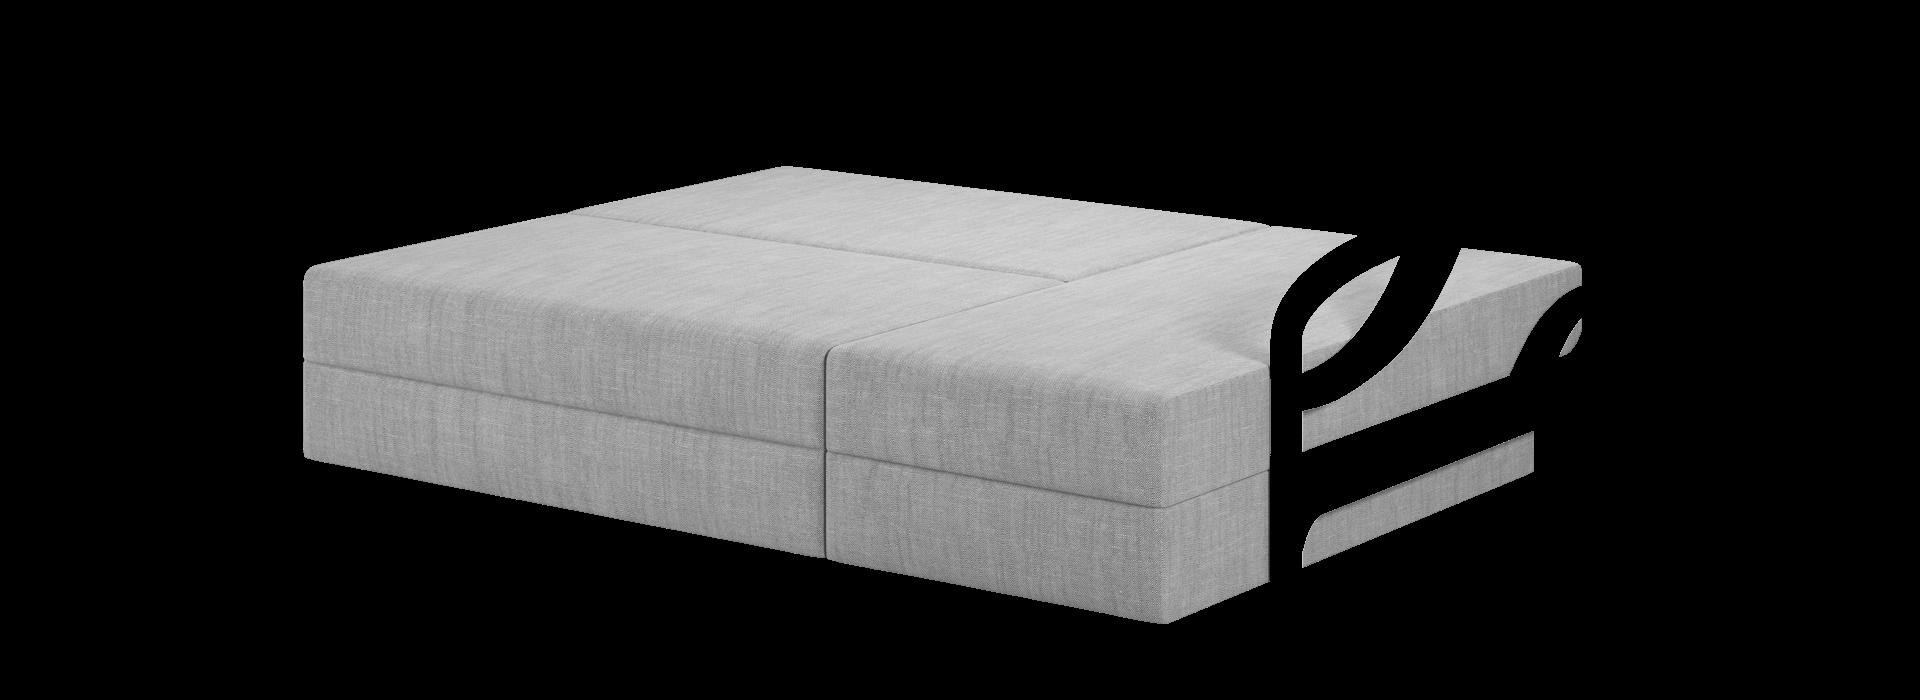 Тамми-4 угловой диван - маска 3